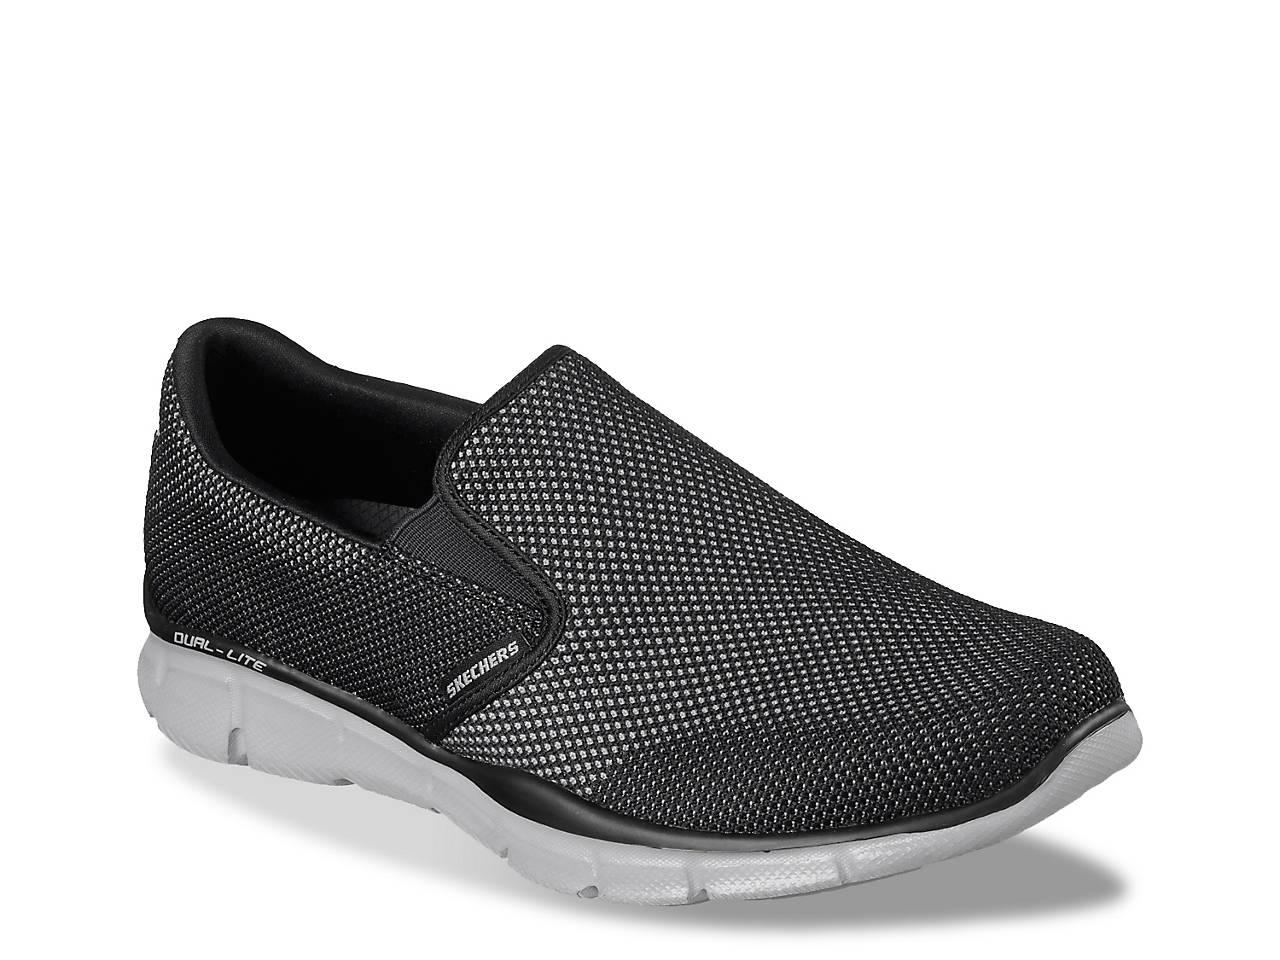 EQUALIZER - Slip-ons - black New Style xndc58q2